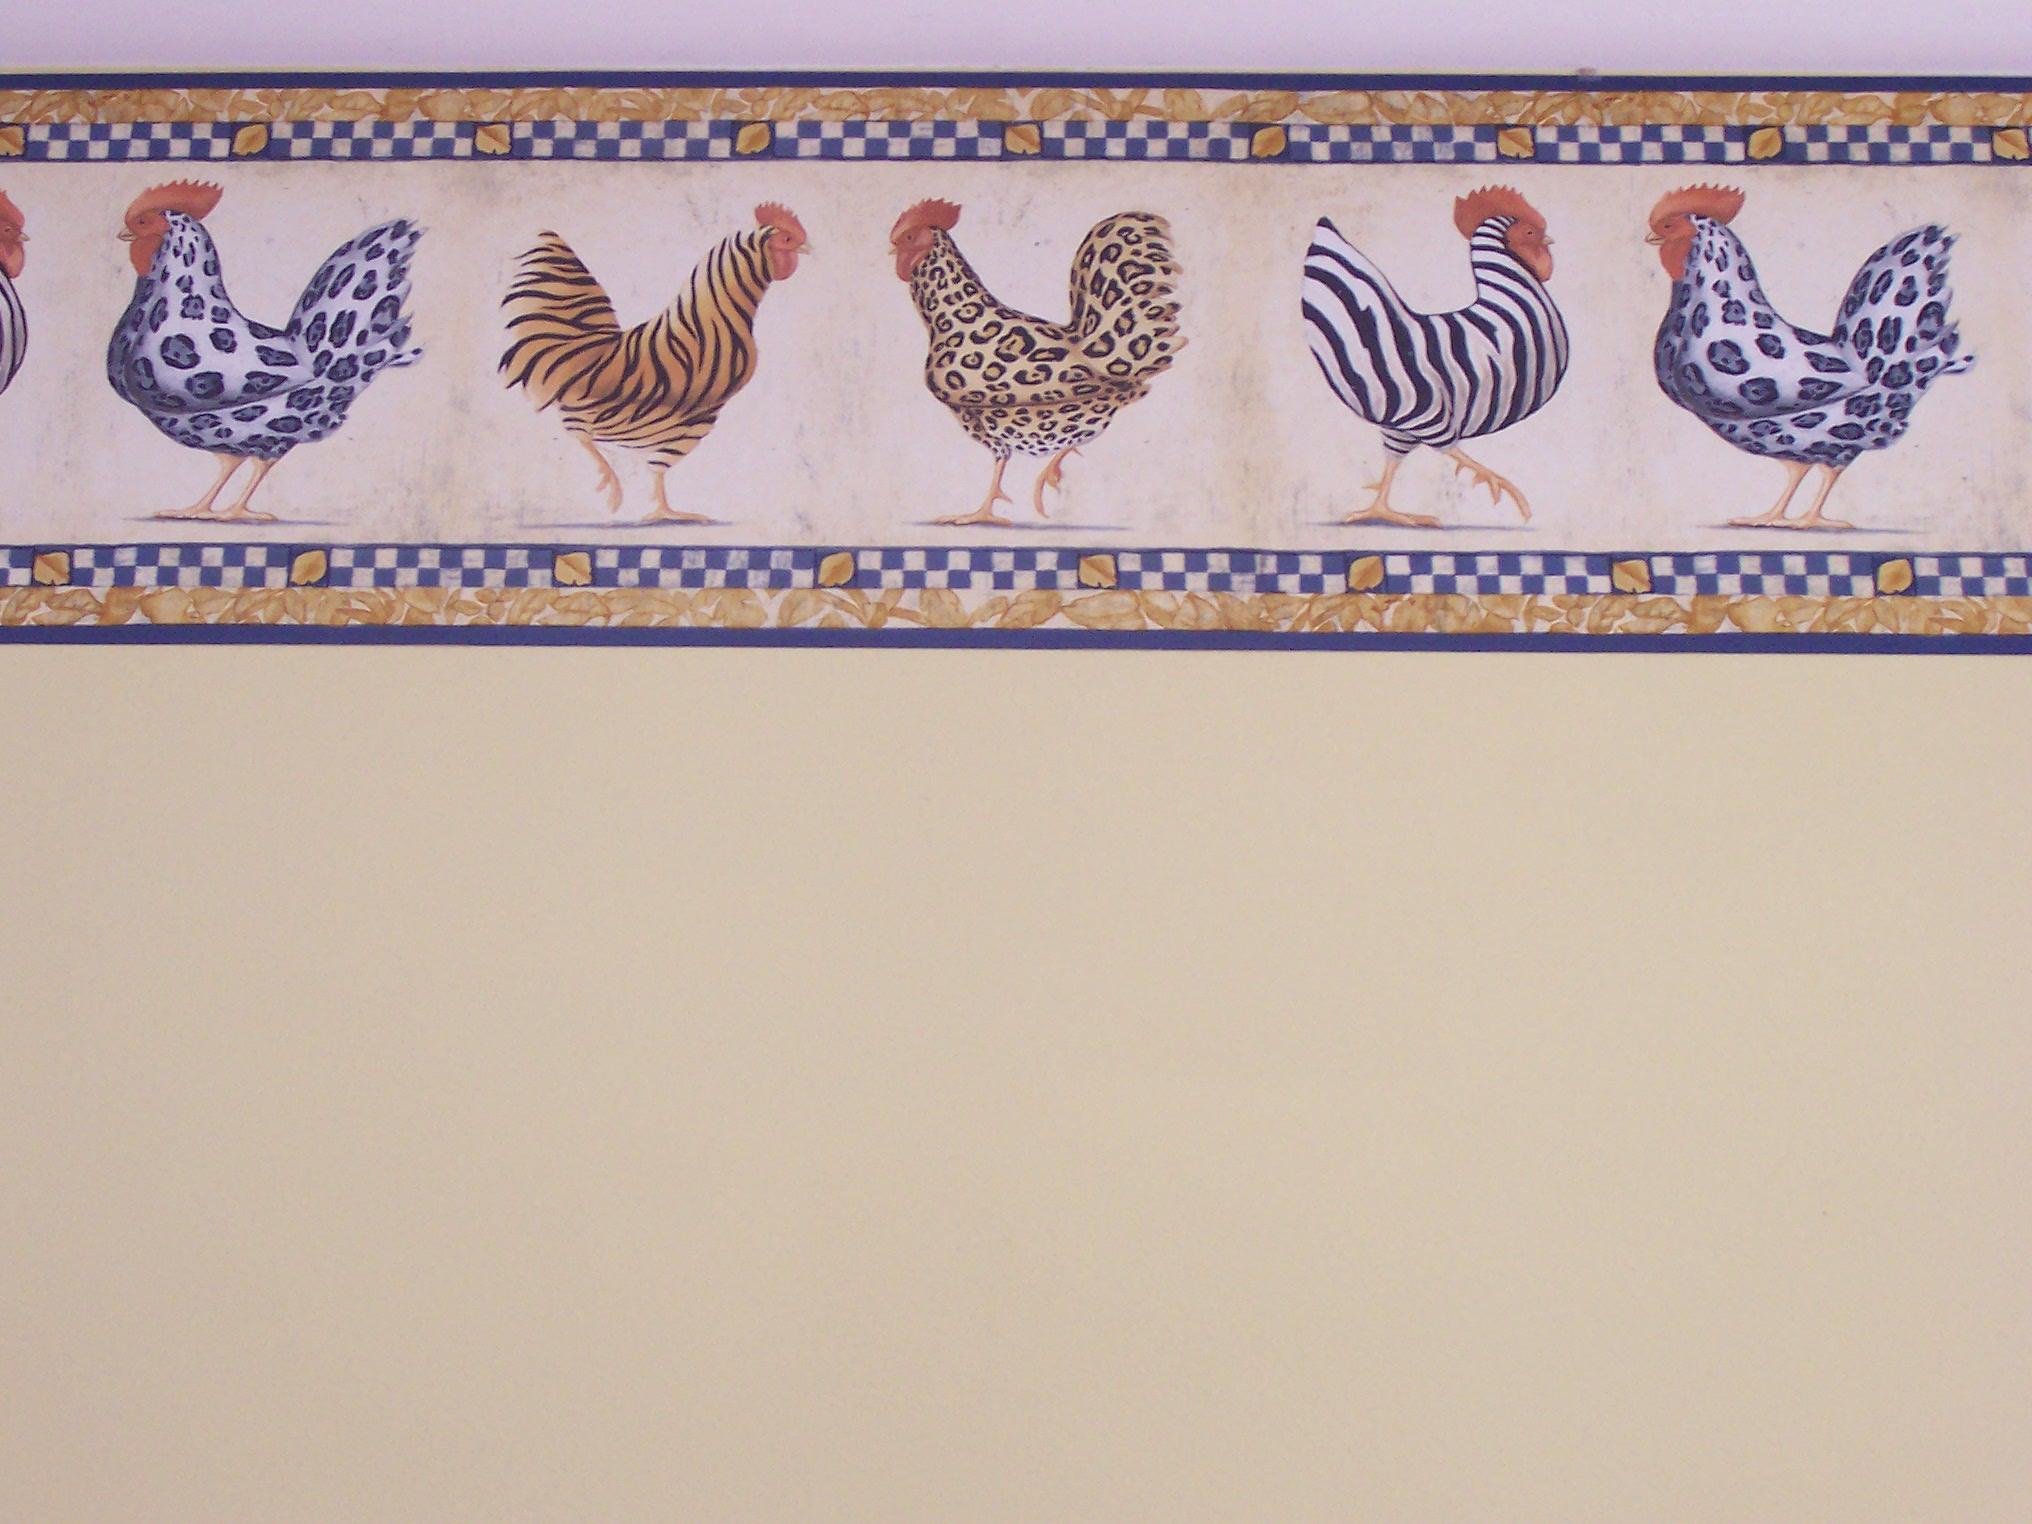 New Wallpaper zebra print wallpaper border 2032x1524